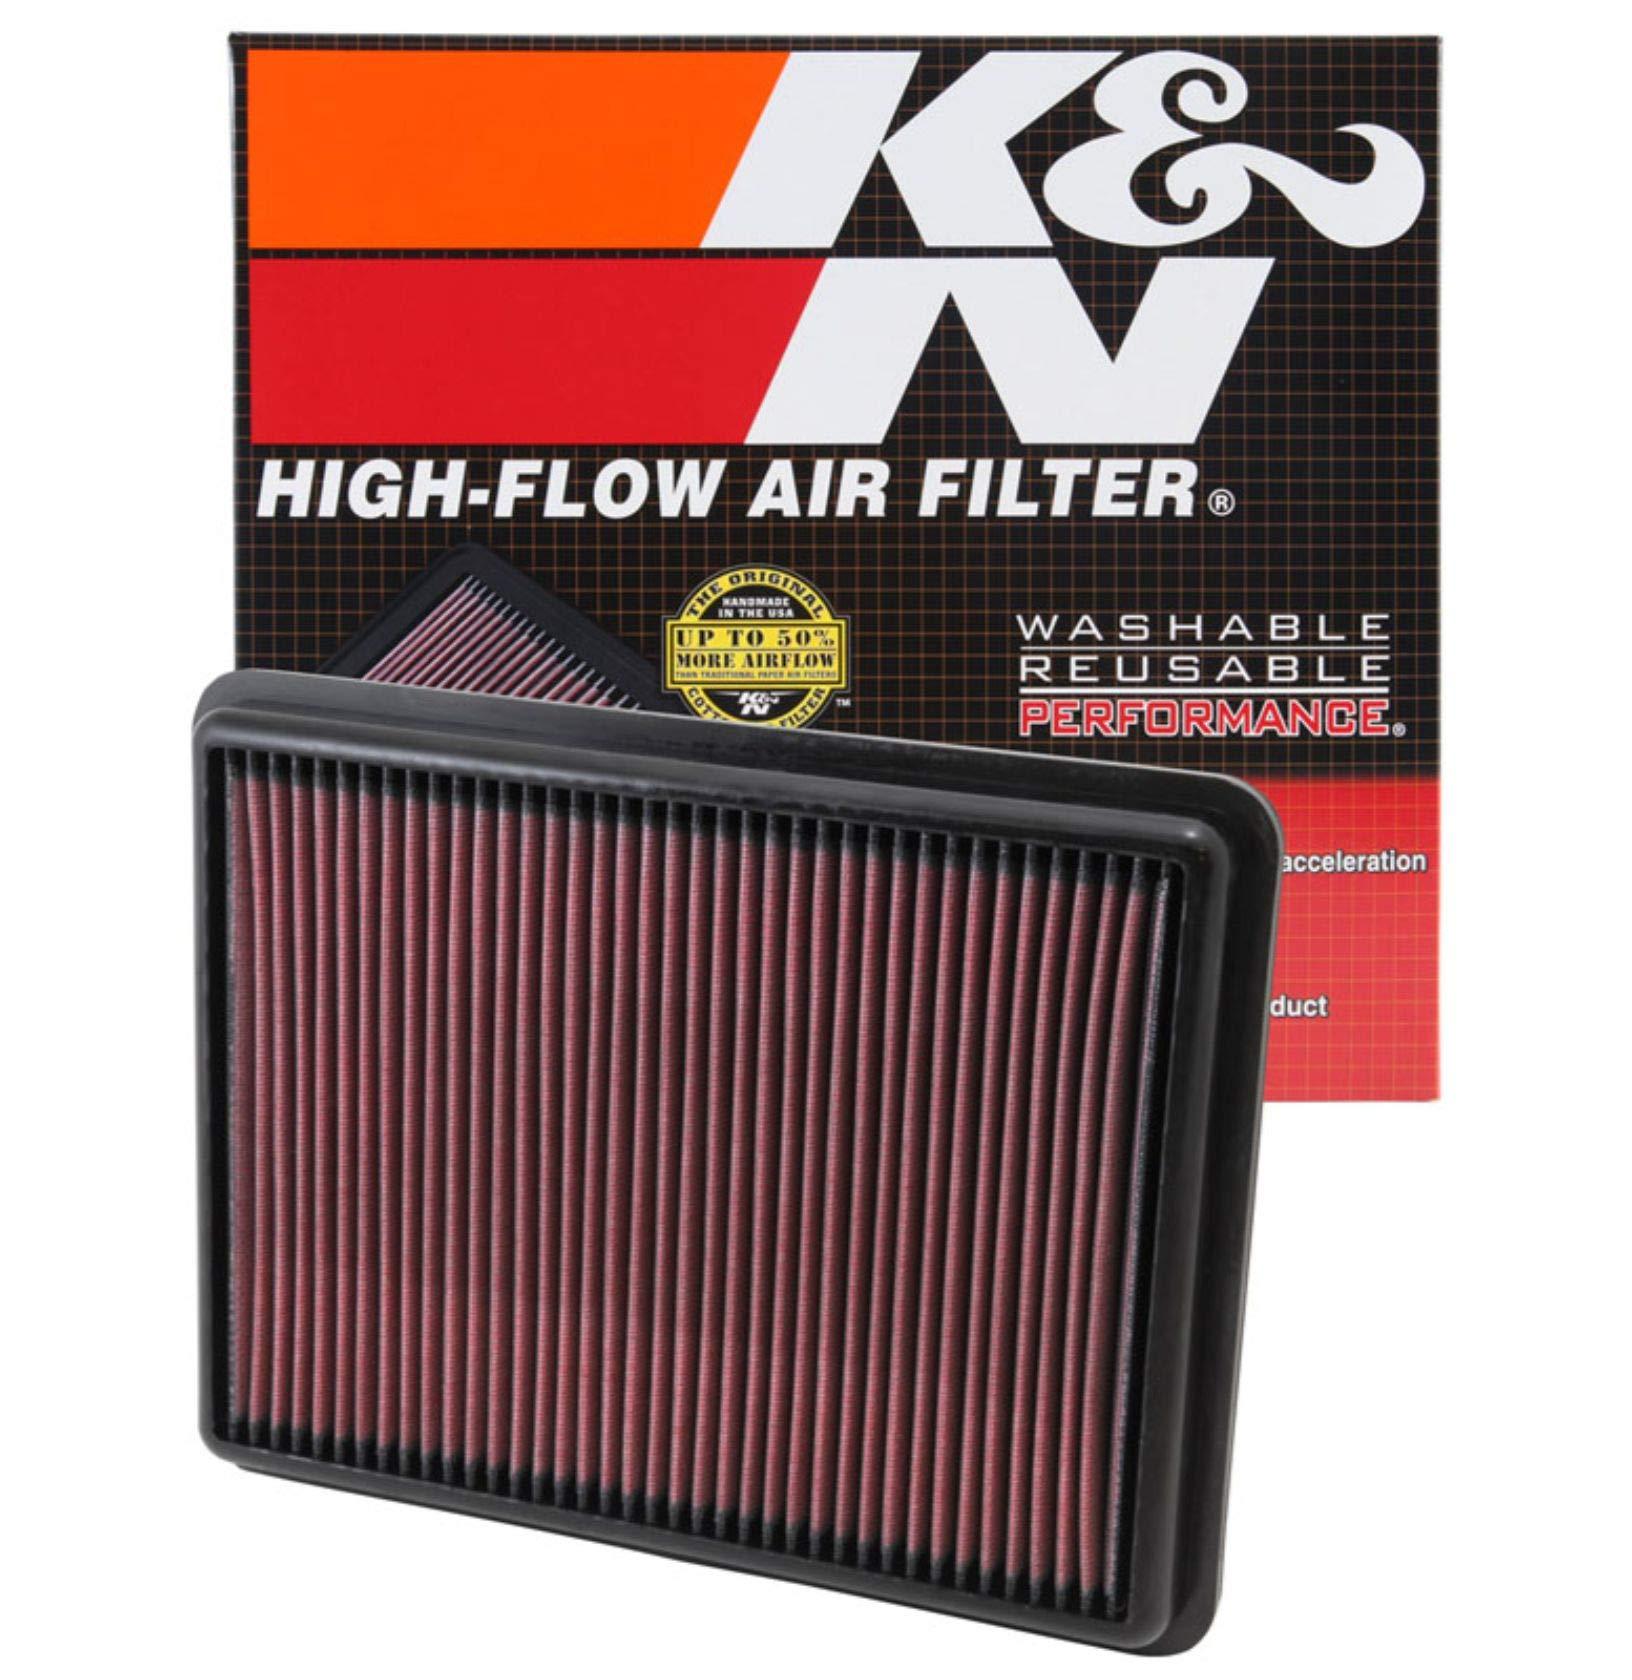 K&N engine air filter, washable and reusable: 2012-2019 Hyundai/Kia (Santa Fe, Sorento) 33-2493 by K&N